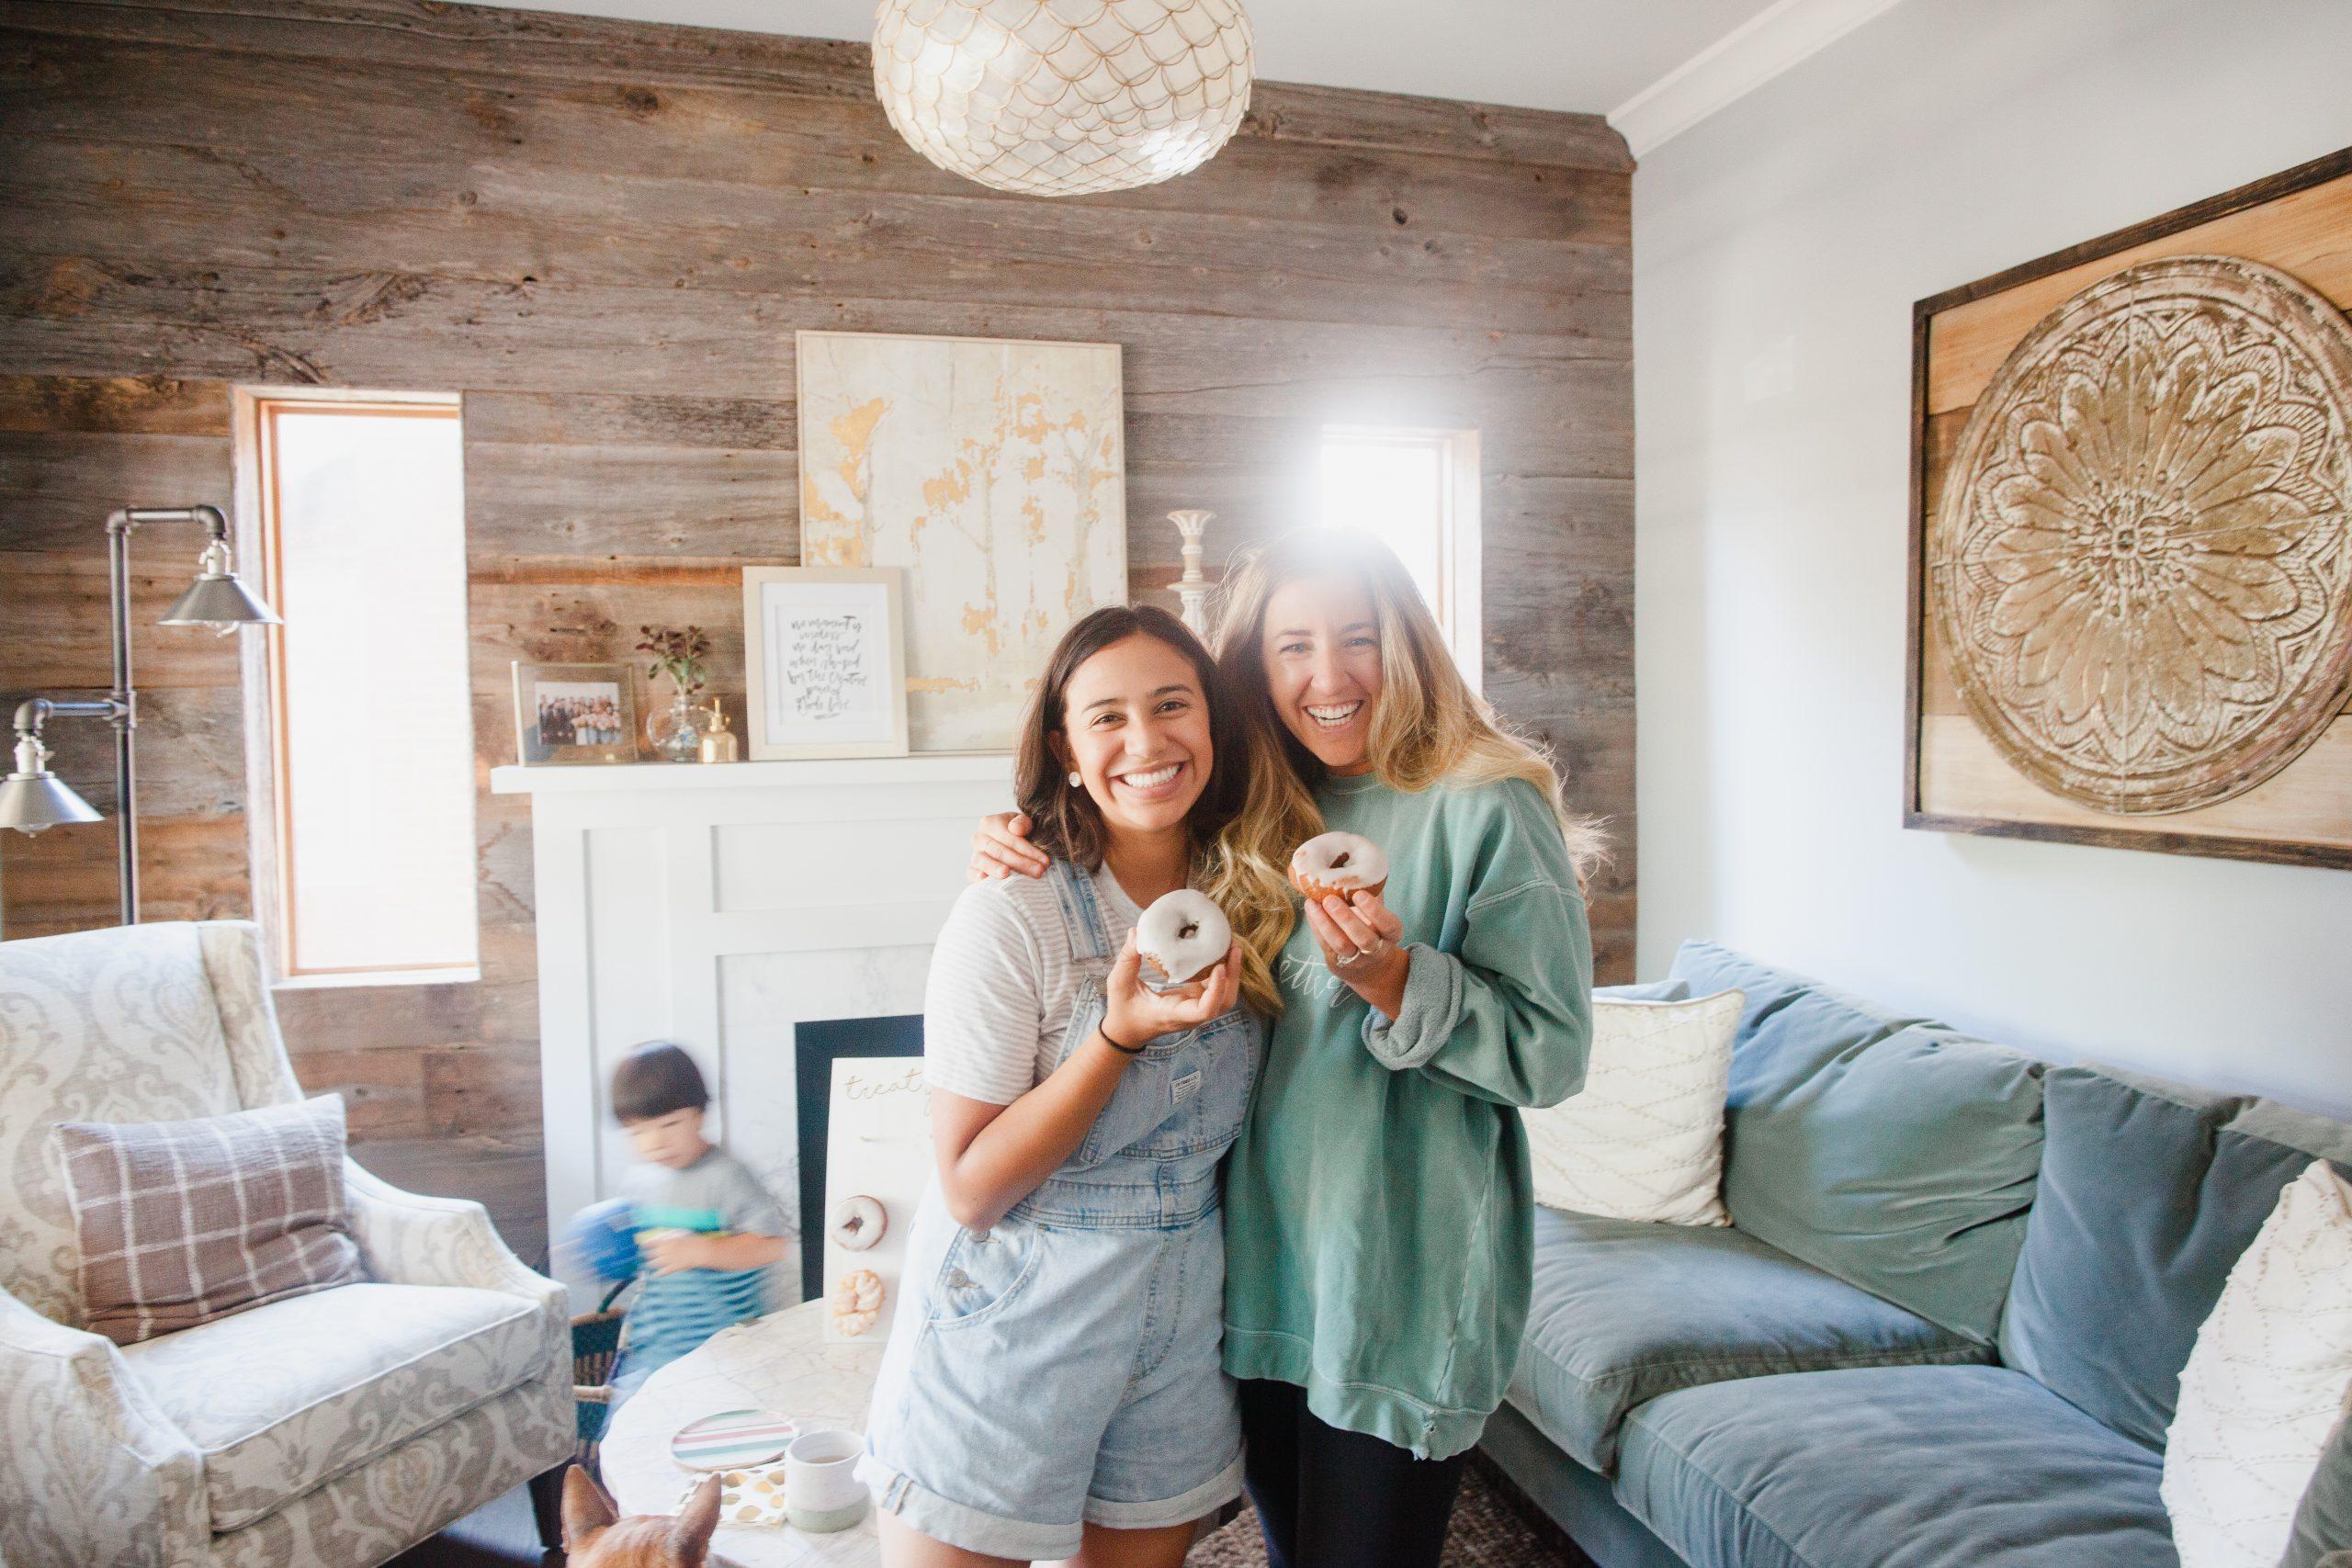 donut, girls holding, friends, jesus, community